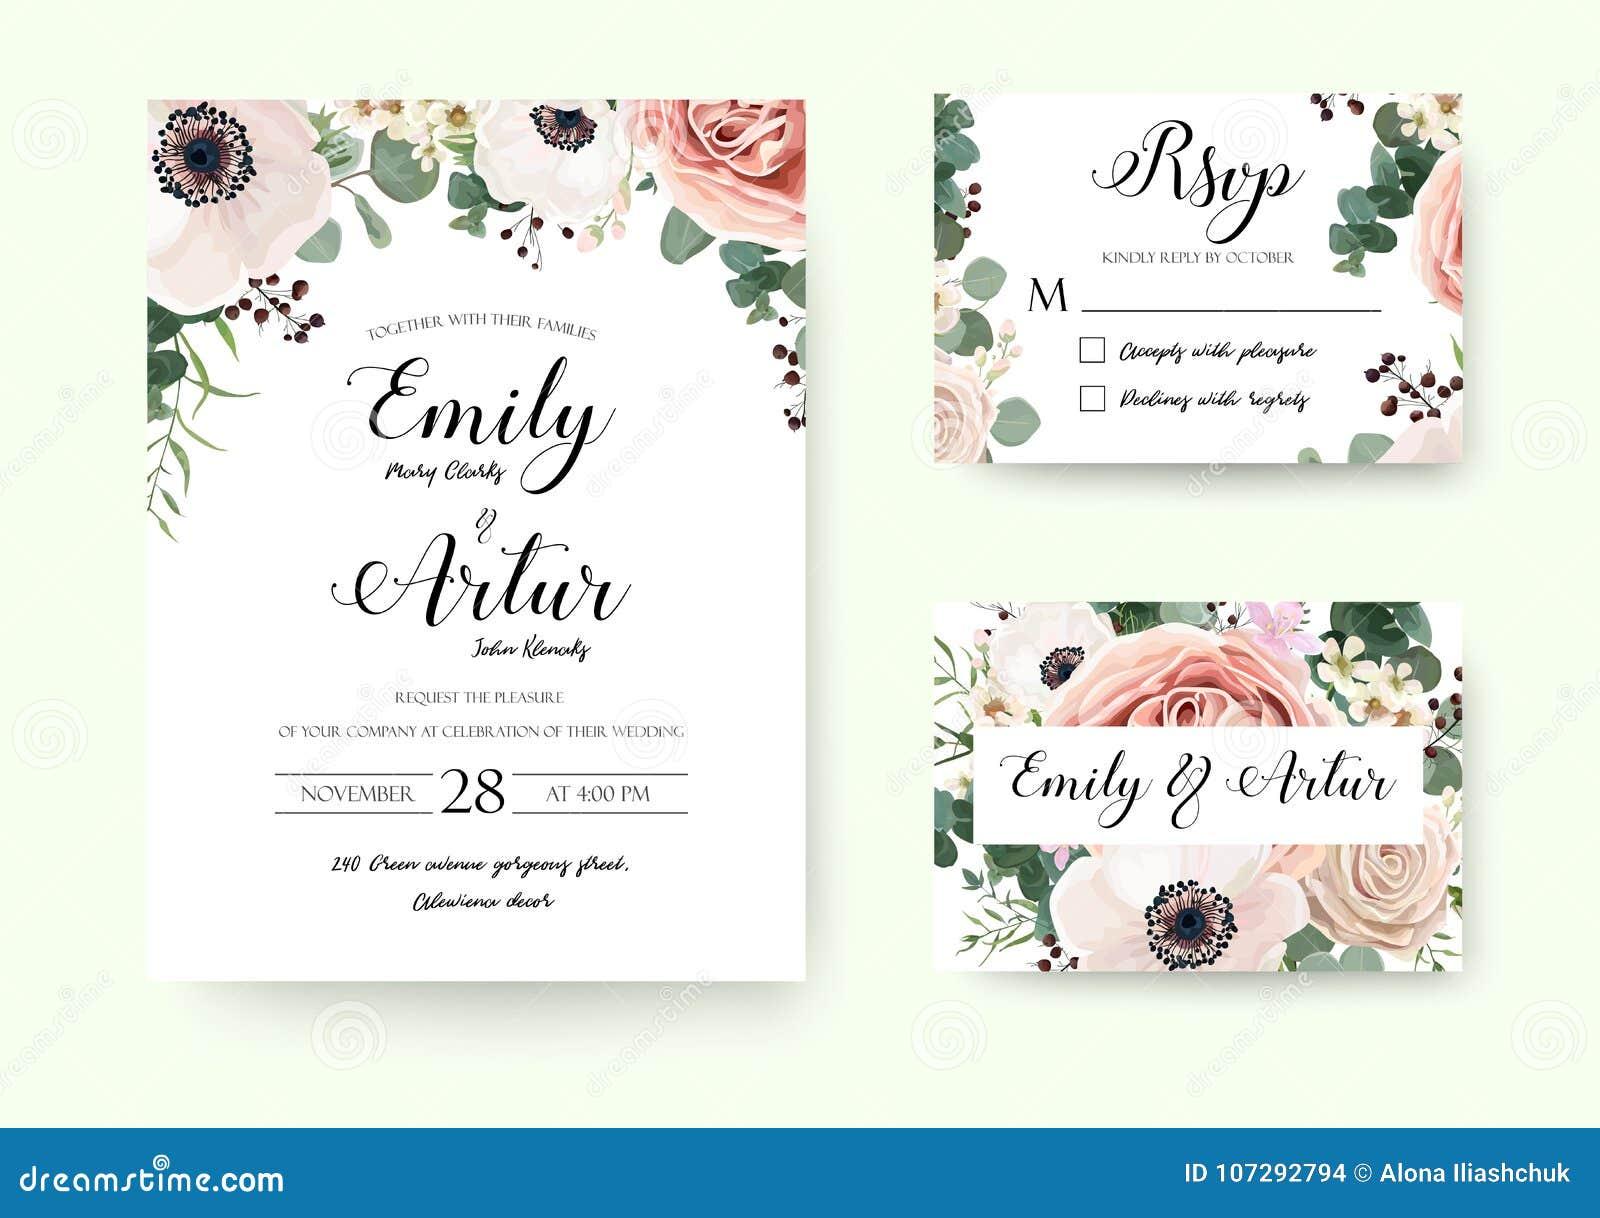 wedding invitation floral invite rsvp cute card vector designs s